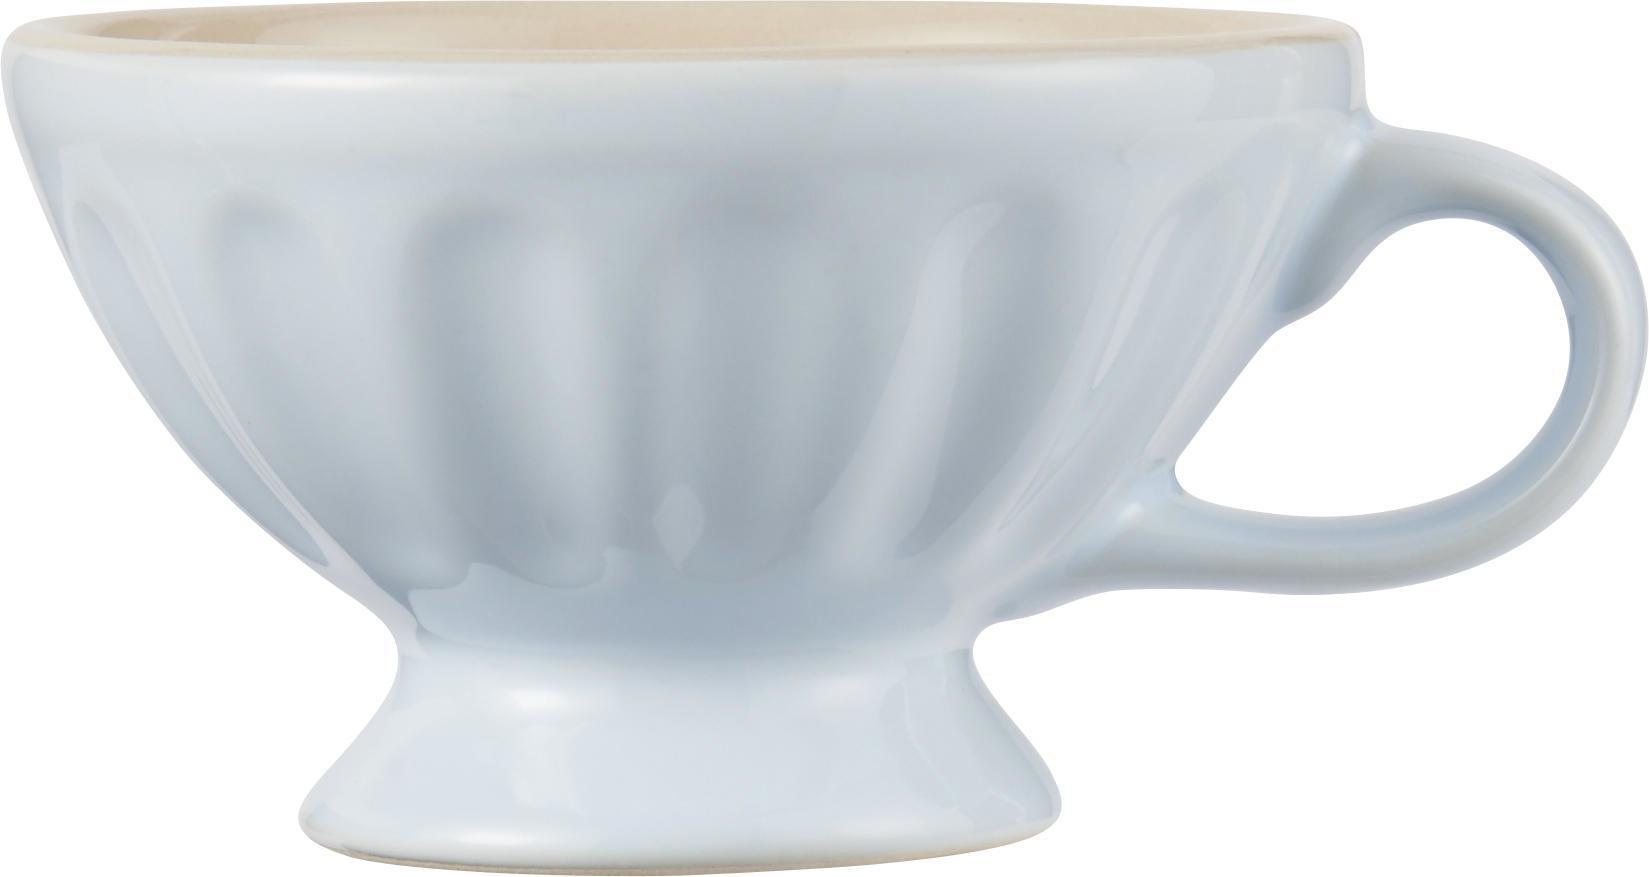 IB LAURSEN Hrneček Jumbo Mynte Stillwater, modrá barva, keramika